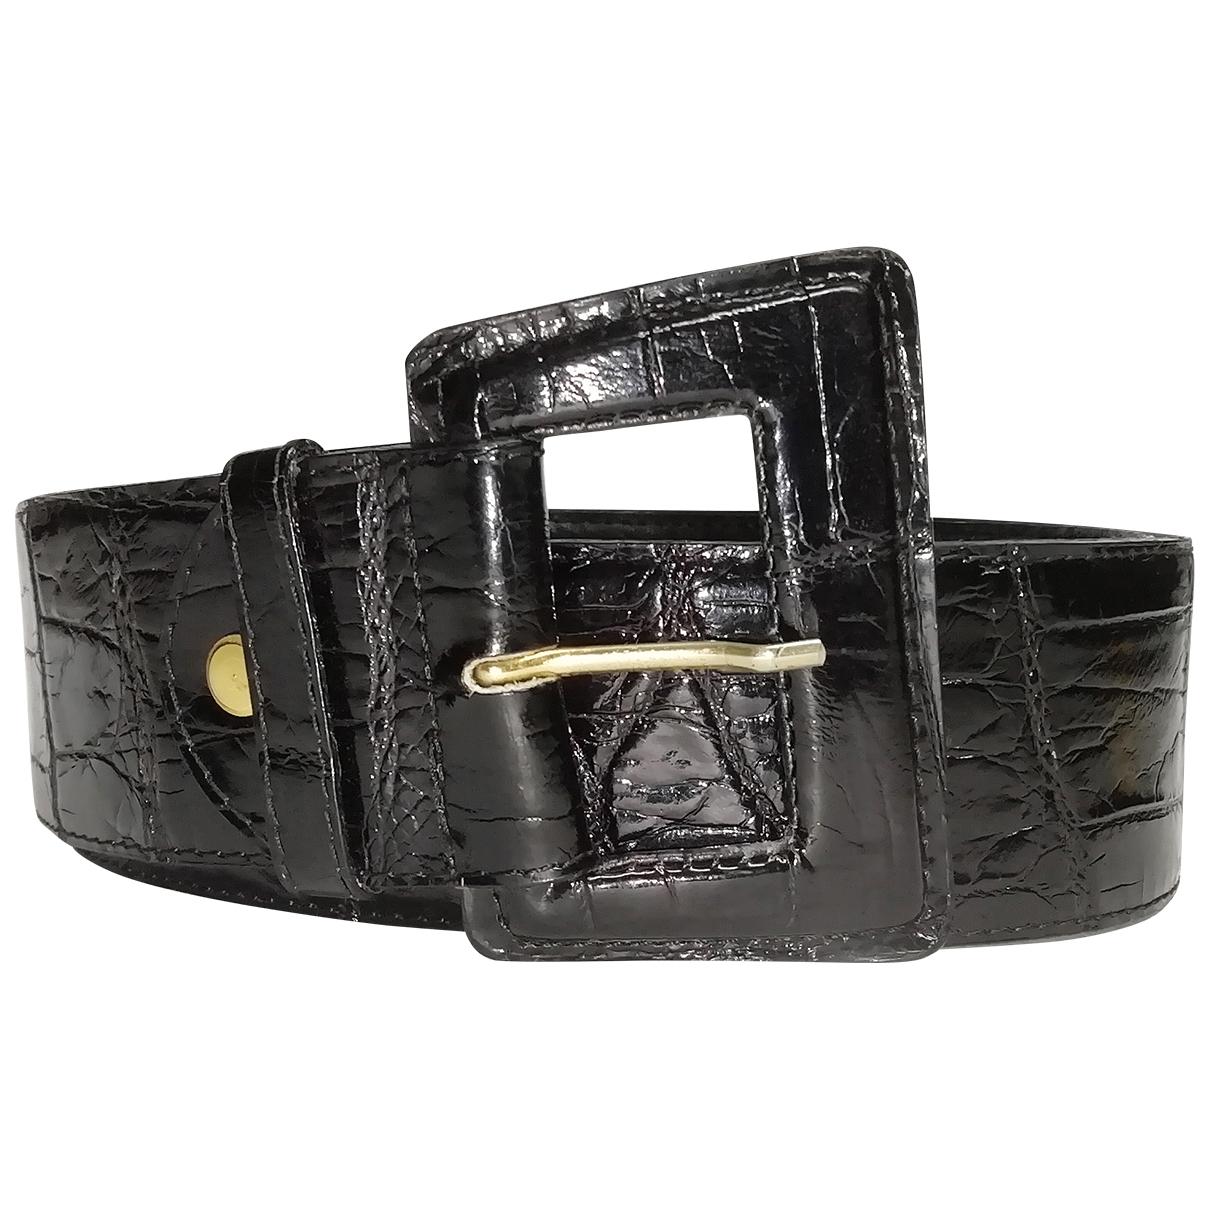 Cinturon de Aligator Non Signe / Unsigned